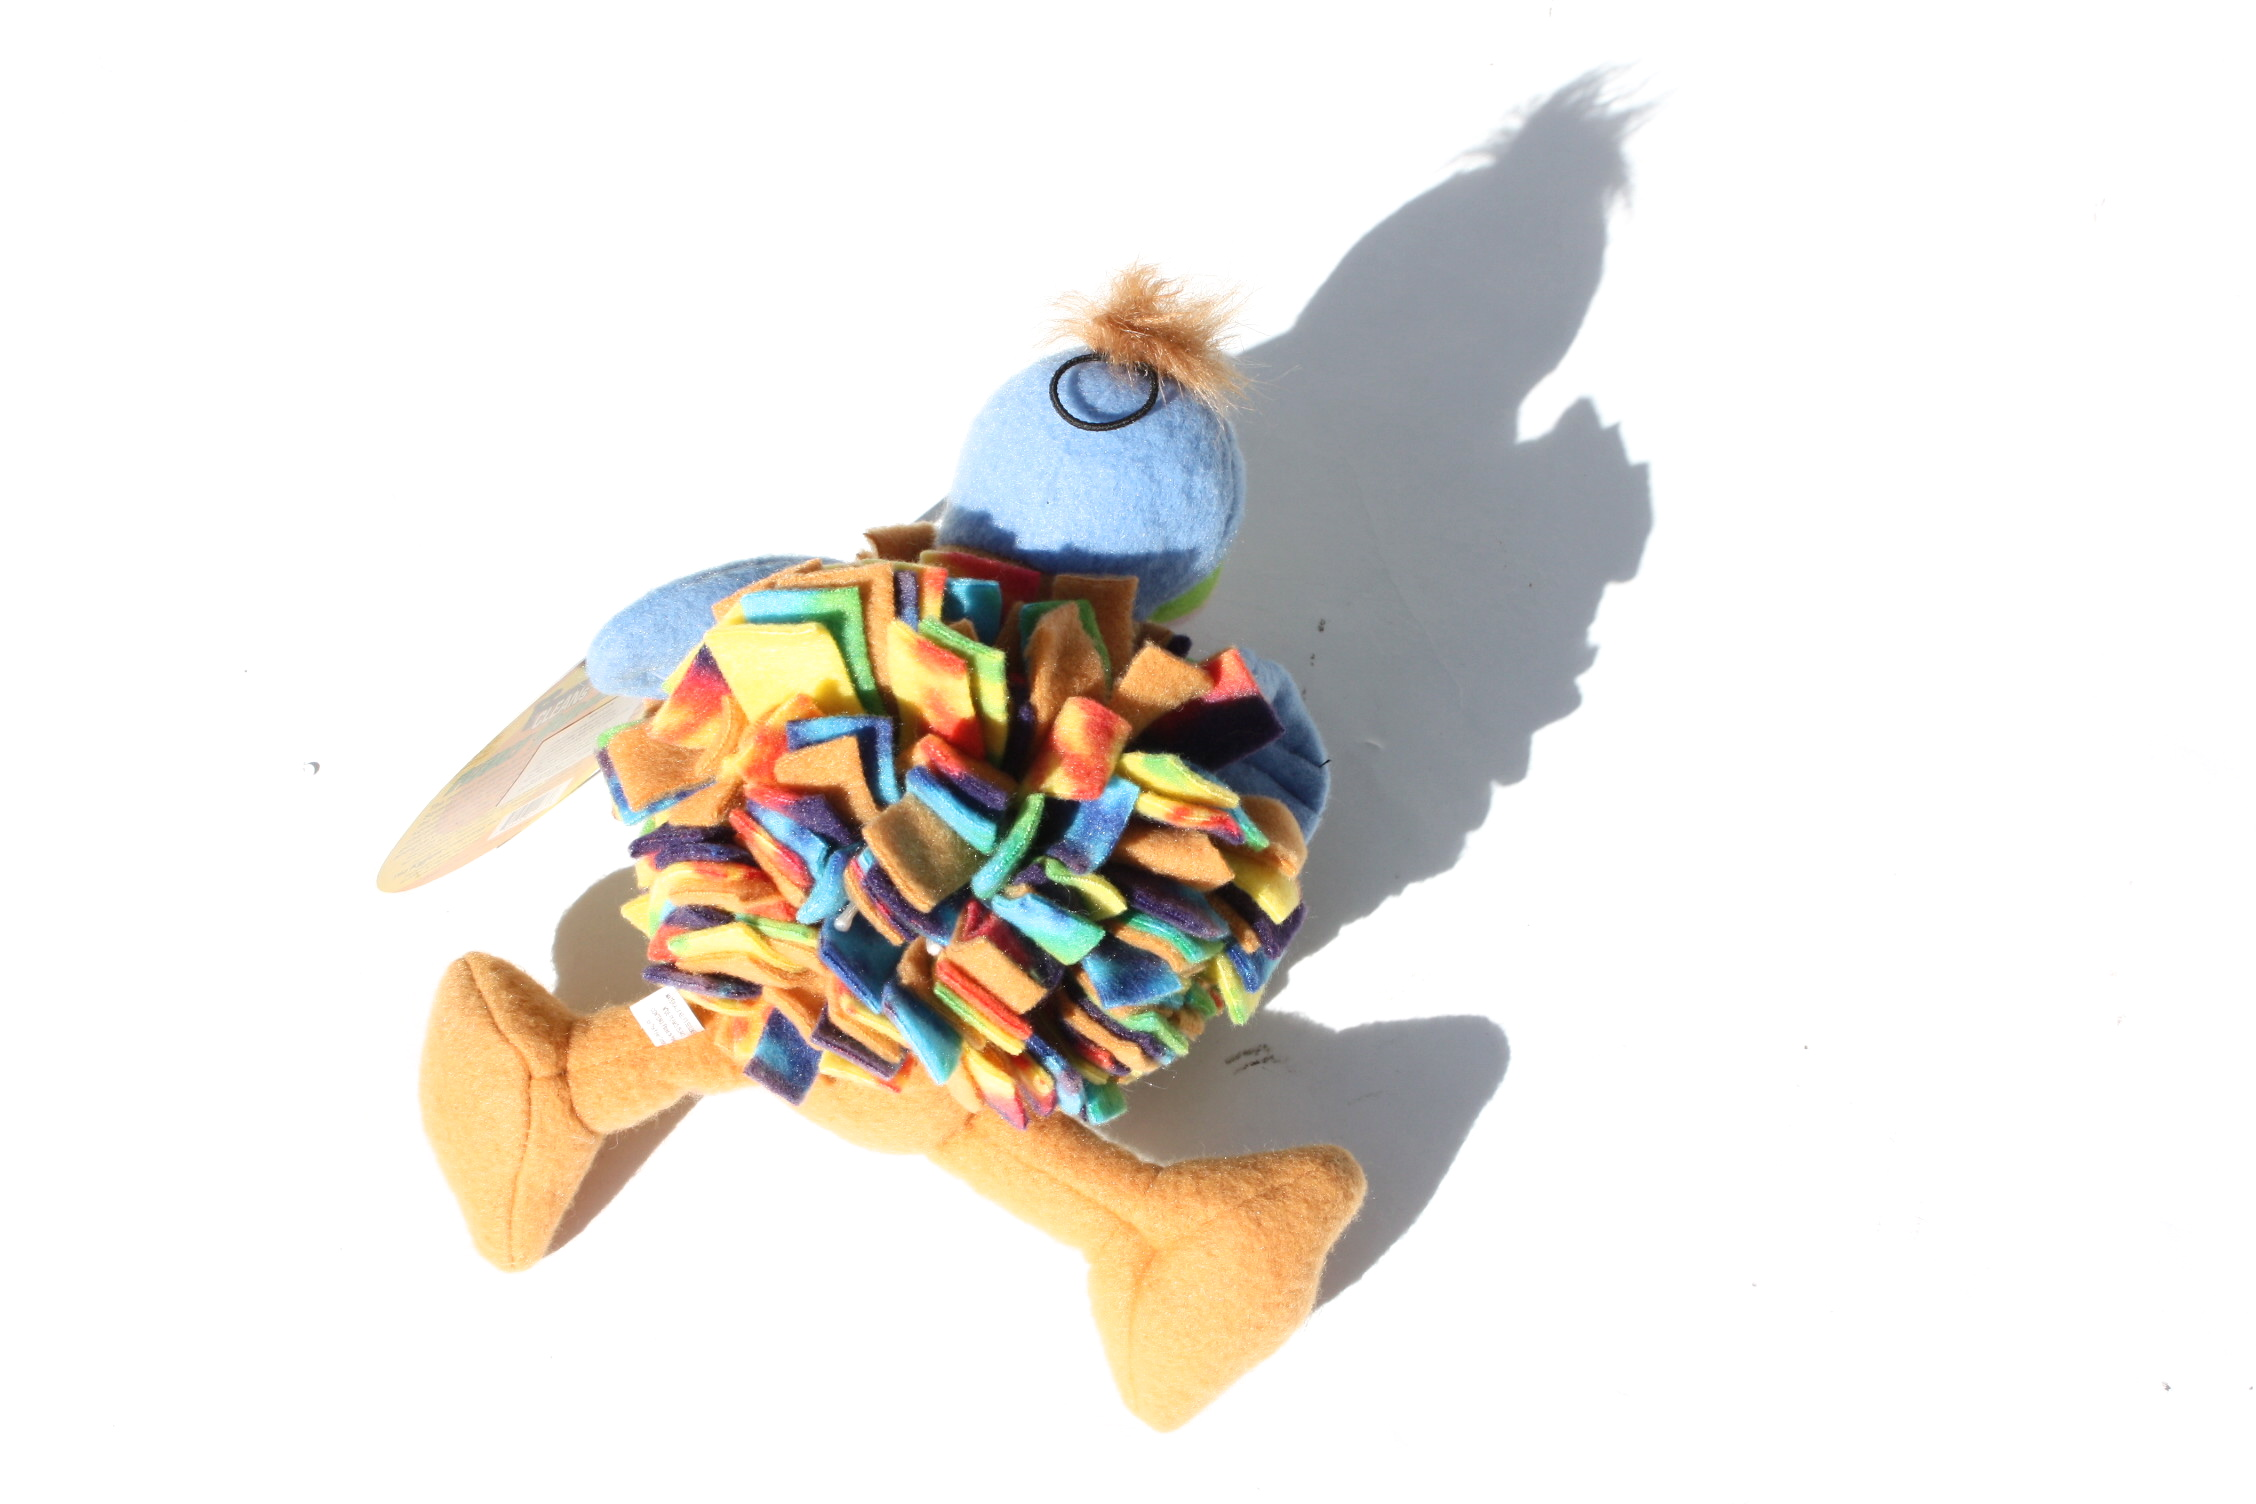 Fleecy Squeaks Dog Toy Toucan フリーシー スクイーカー ドッグトーイ  トゥーカン_d0217958_19132798.jpg